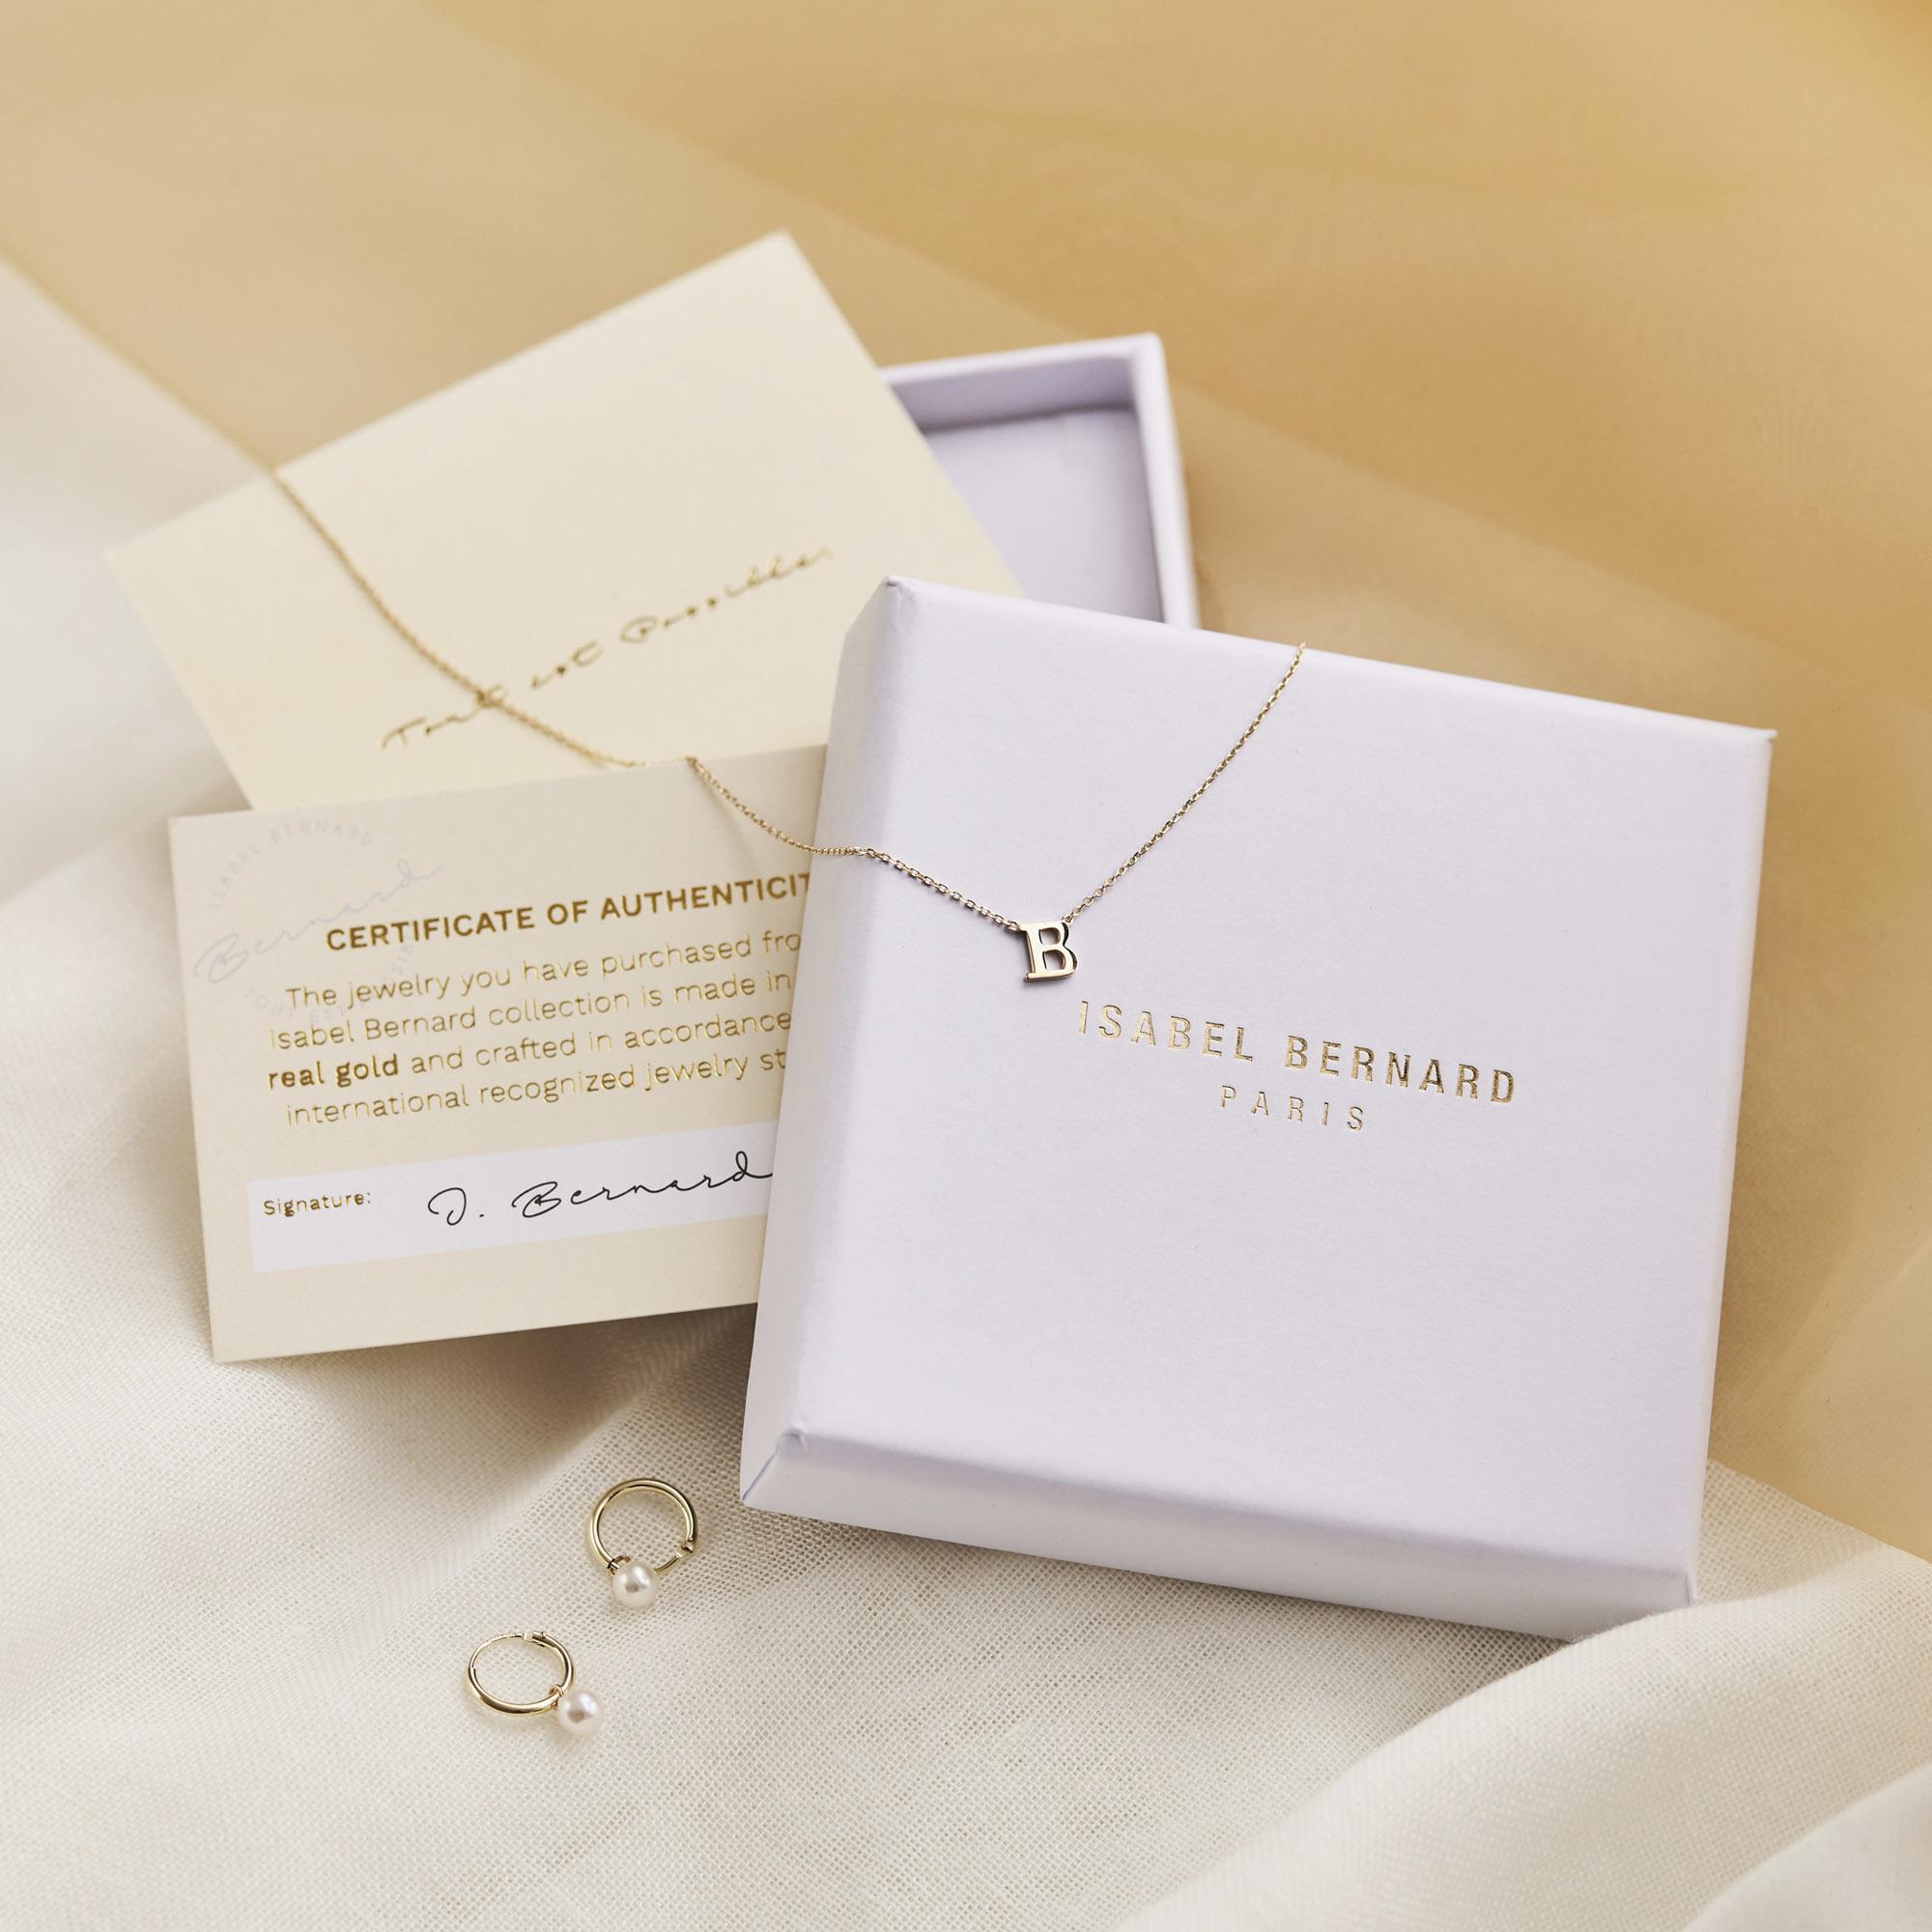 Isabel Bernard Le Marais Loulou 14 karaat gouden collier met ringetjes